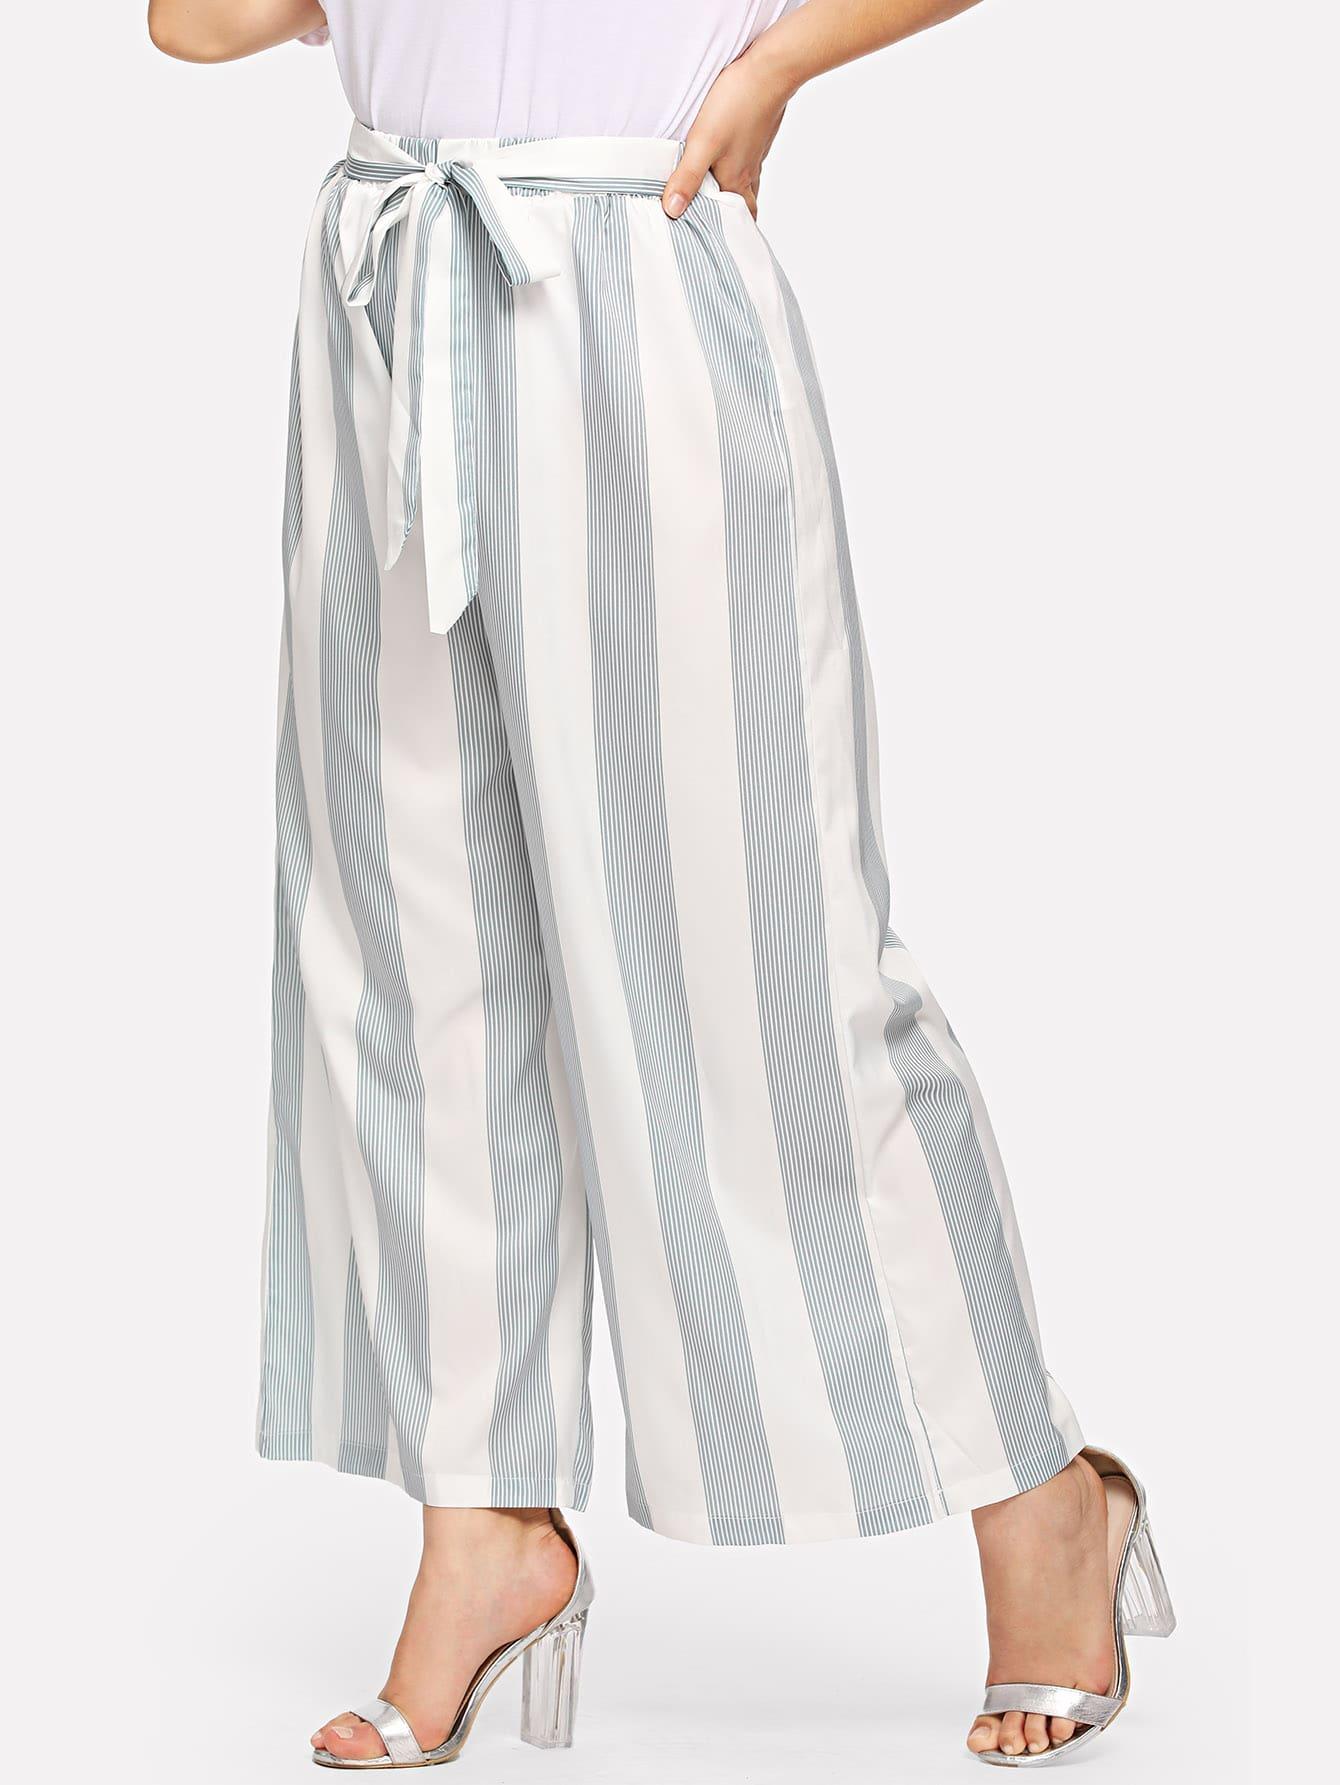 List london vintage Autumn Spring Cotton Women Round Neck Patch Pocket Plain Long Sleeve T-Shirts short sleeves polyvore